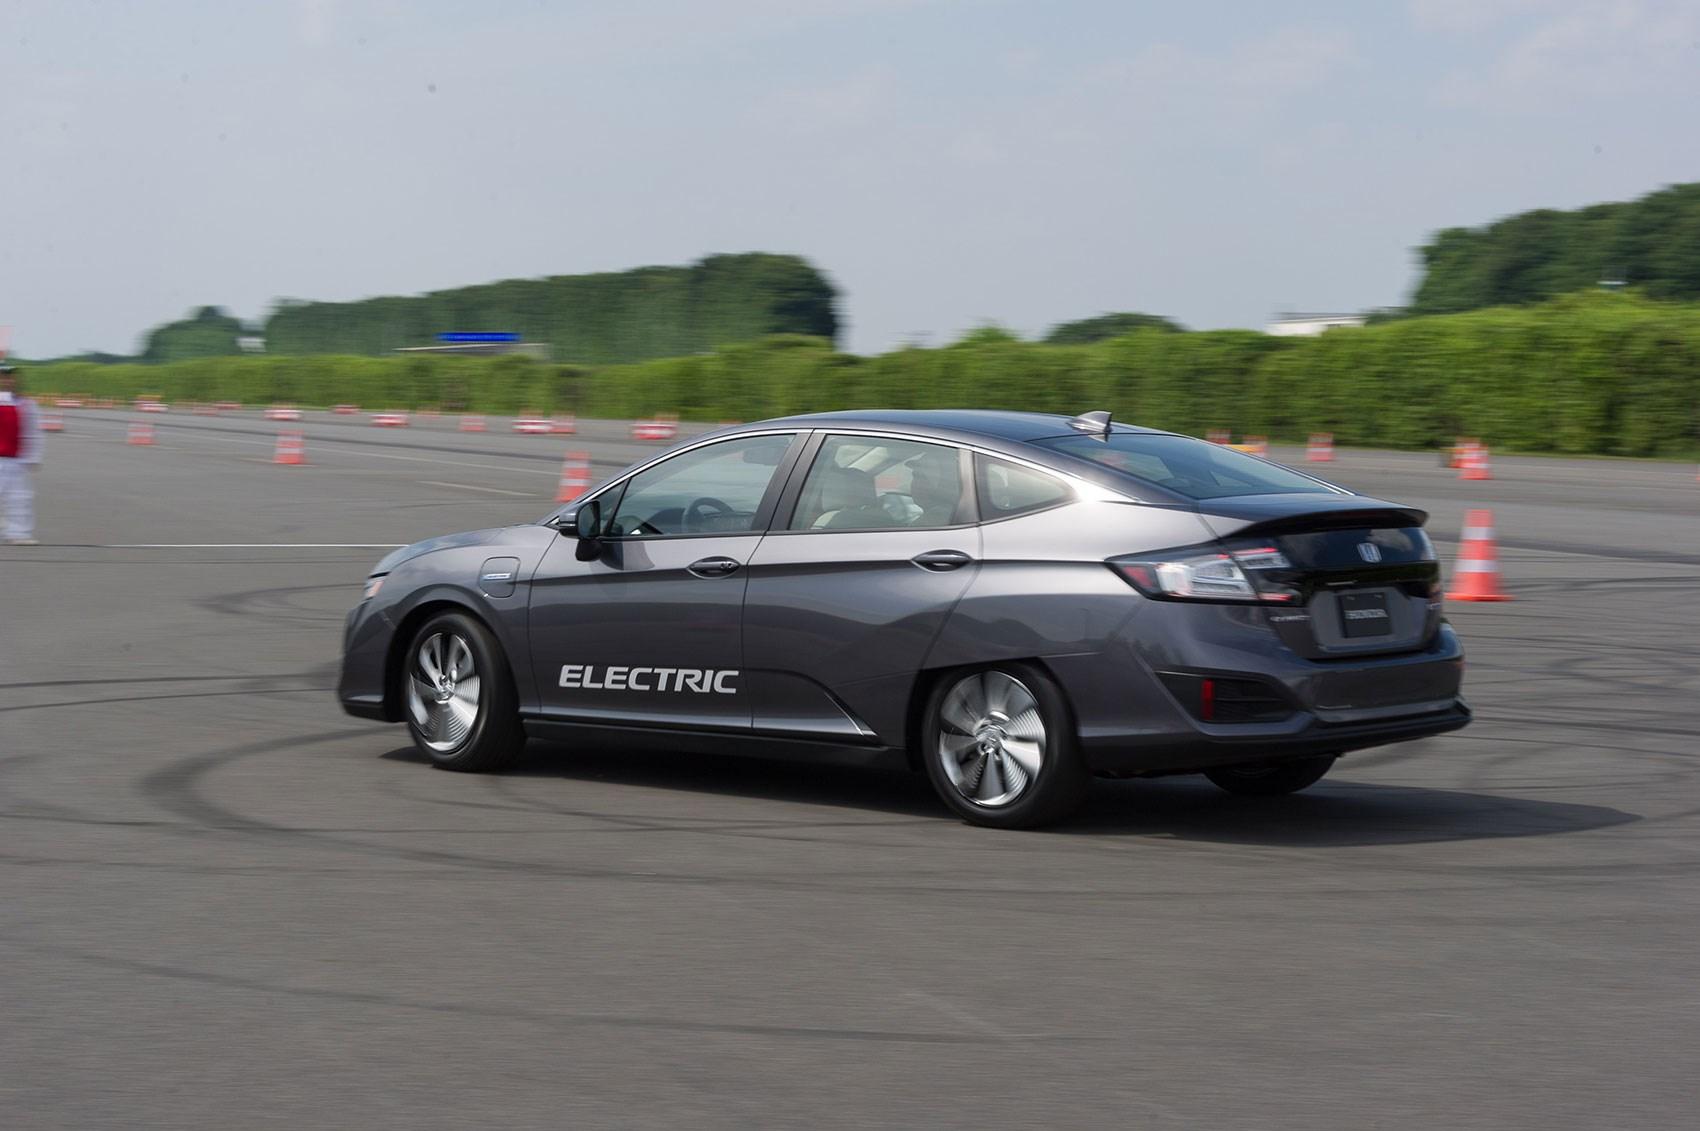 Honda Clarity BEV electric car